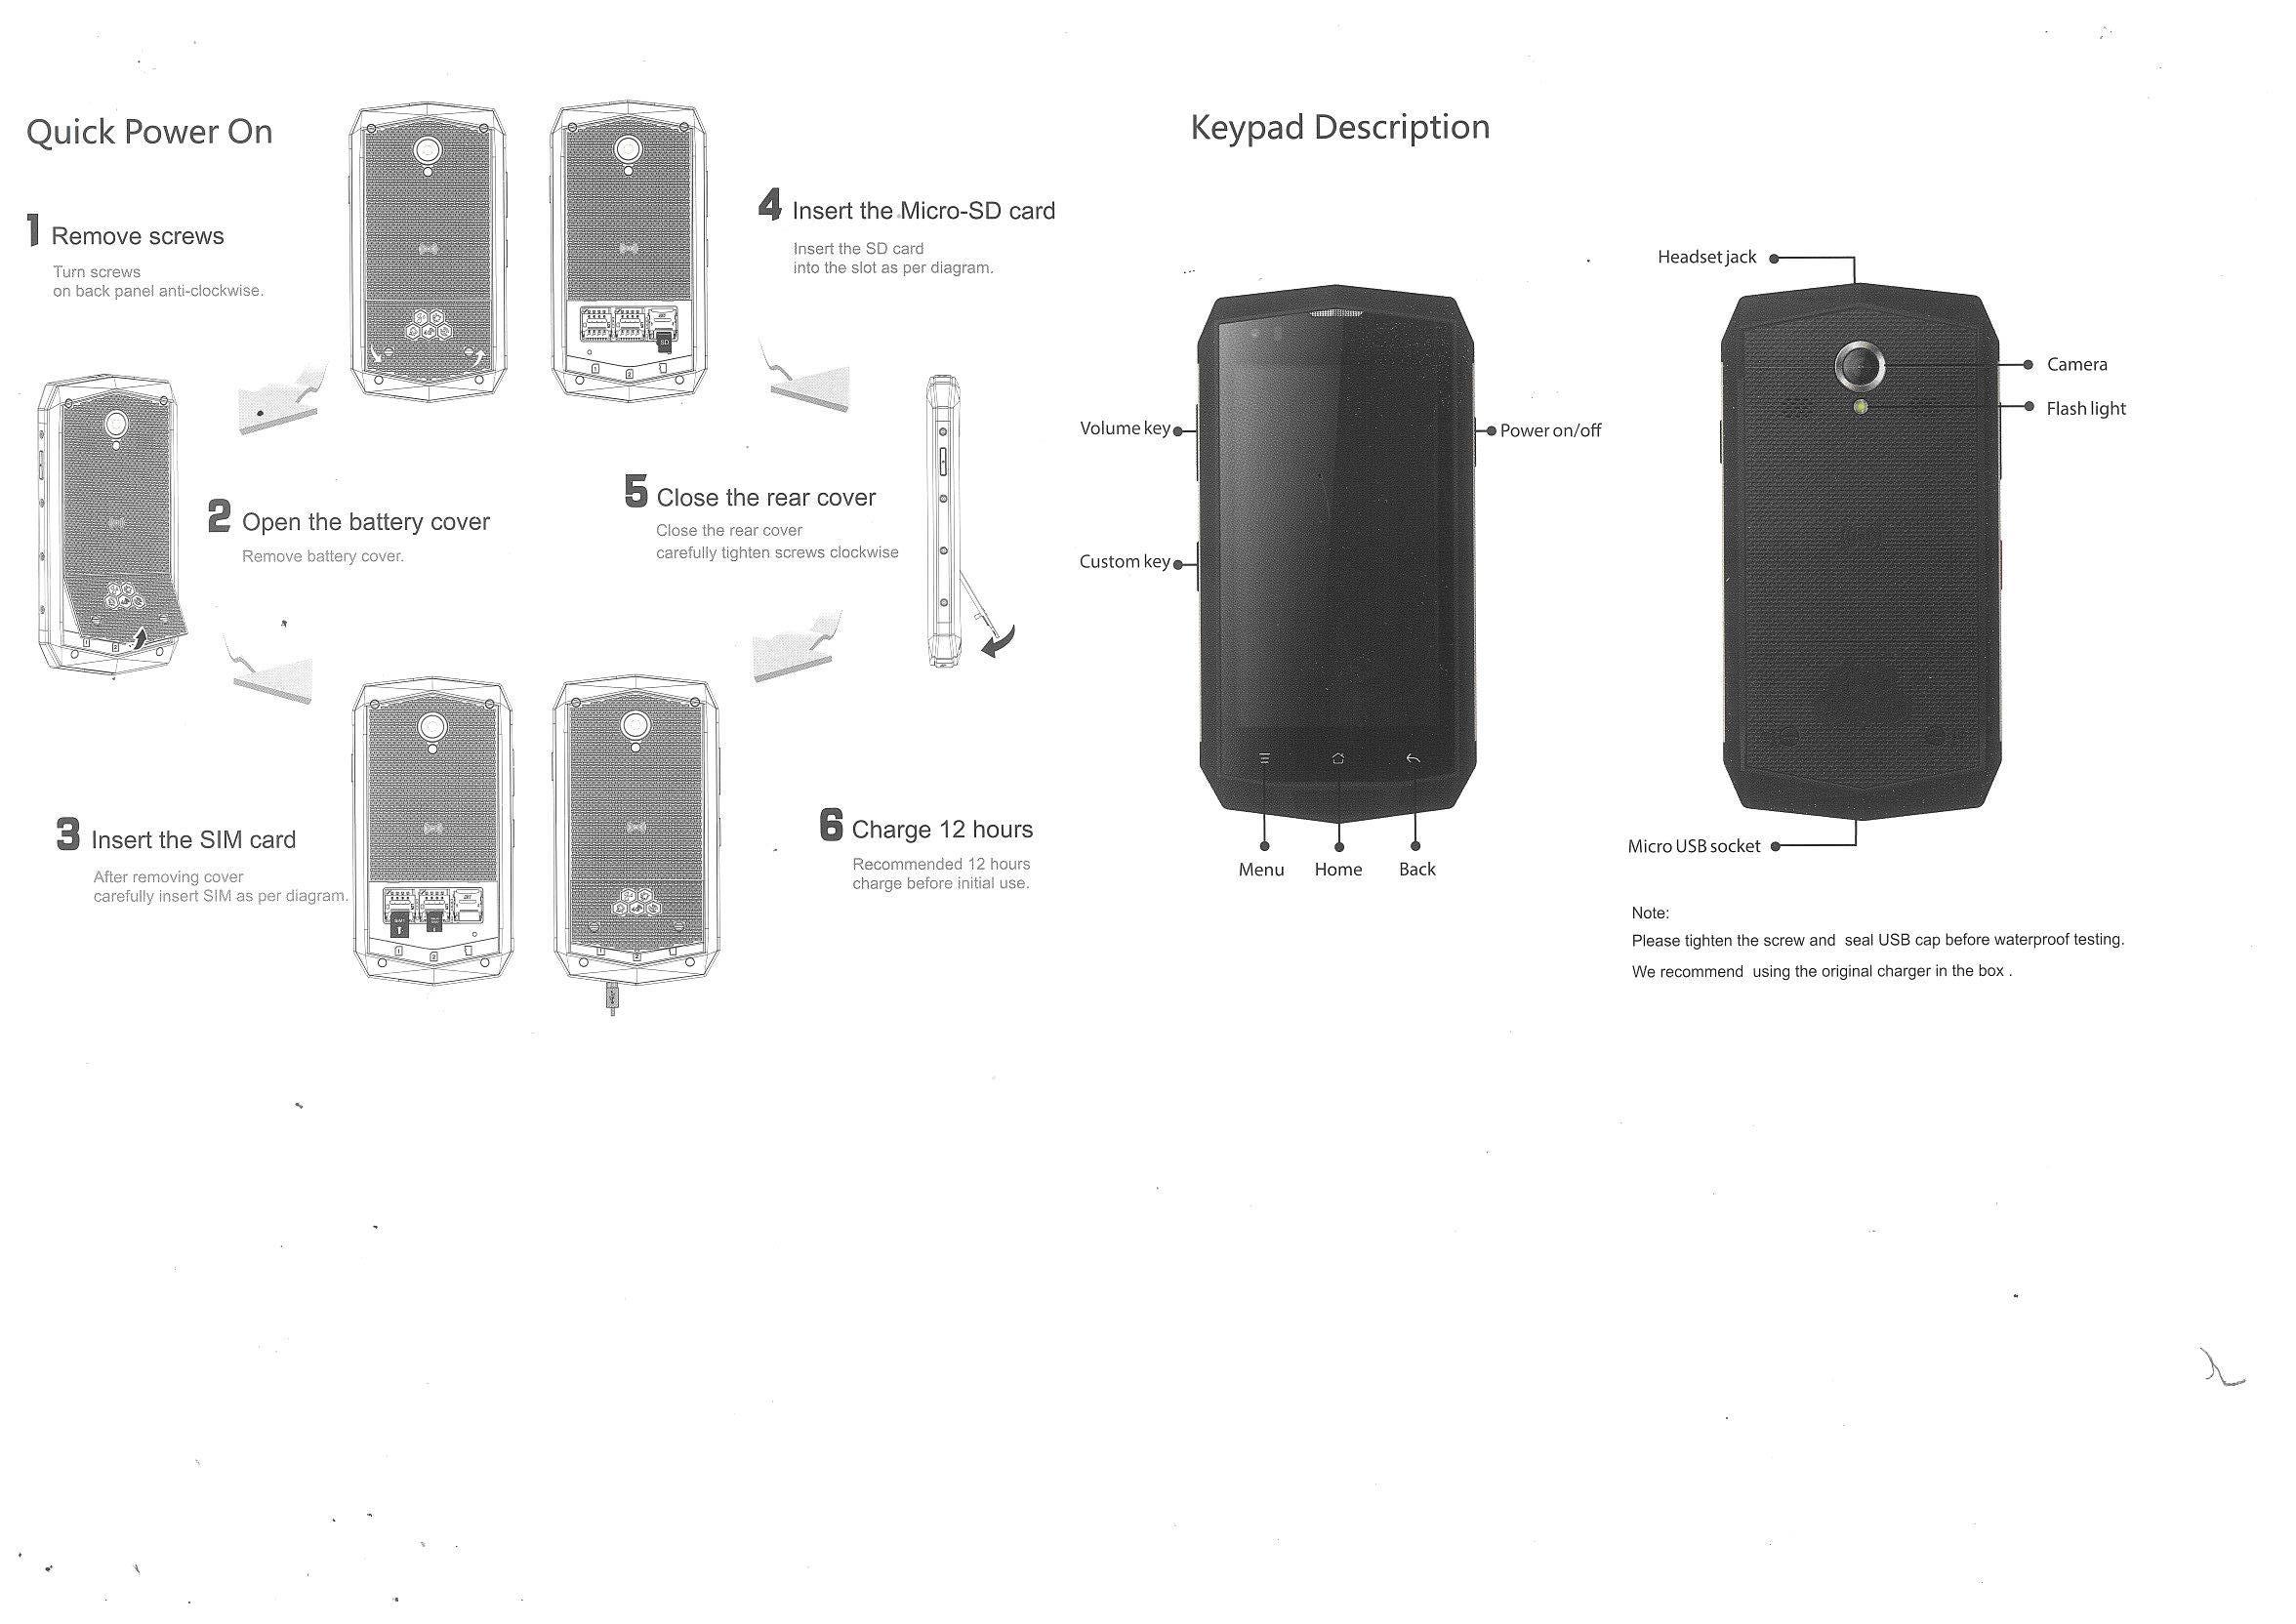 File Management Mdisk Kabel Data Ampamp Charger Usb Micro Steel Mesh G322 Cvafl M957 Manuals Https Chinavasioncom China Wholesale Android Phones Normal Screen Rugtel X16 Rugged Smartphone